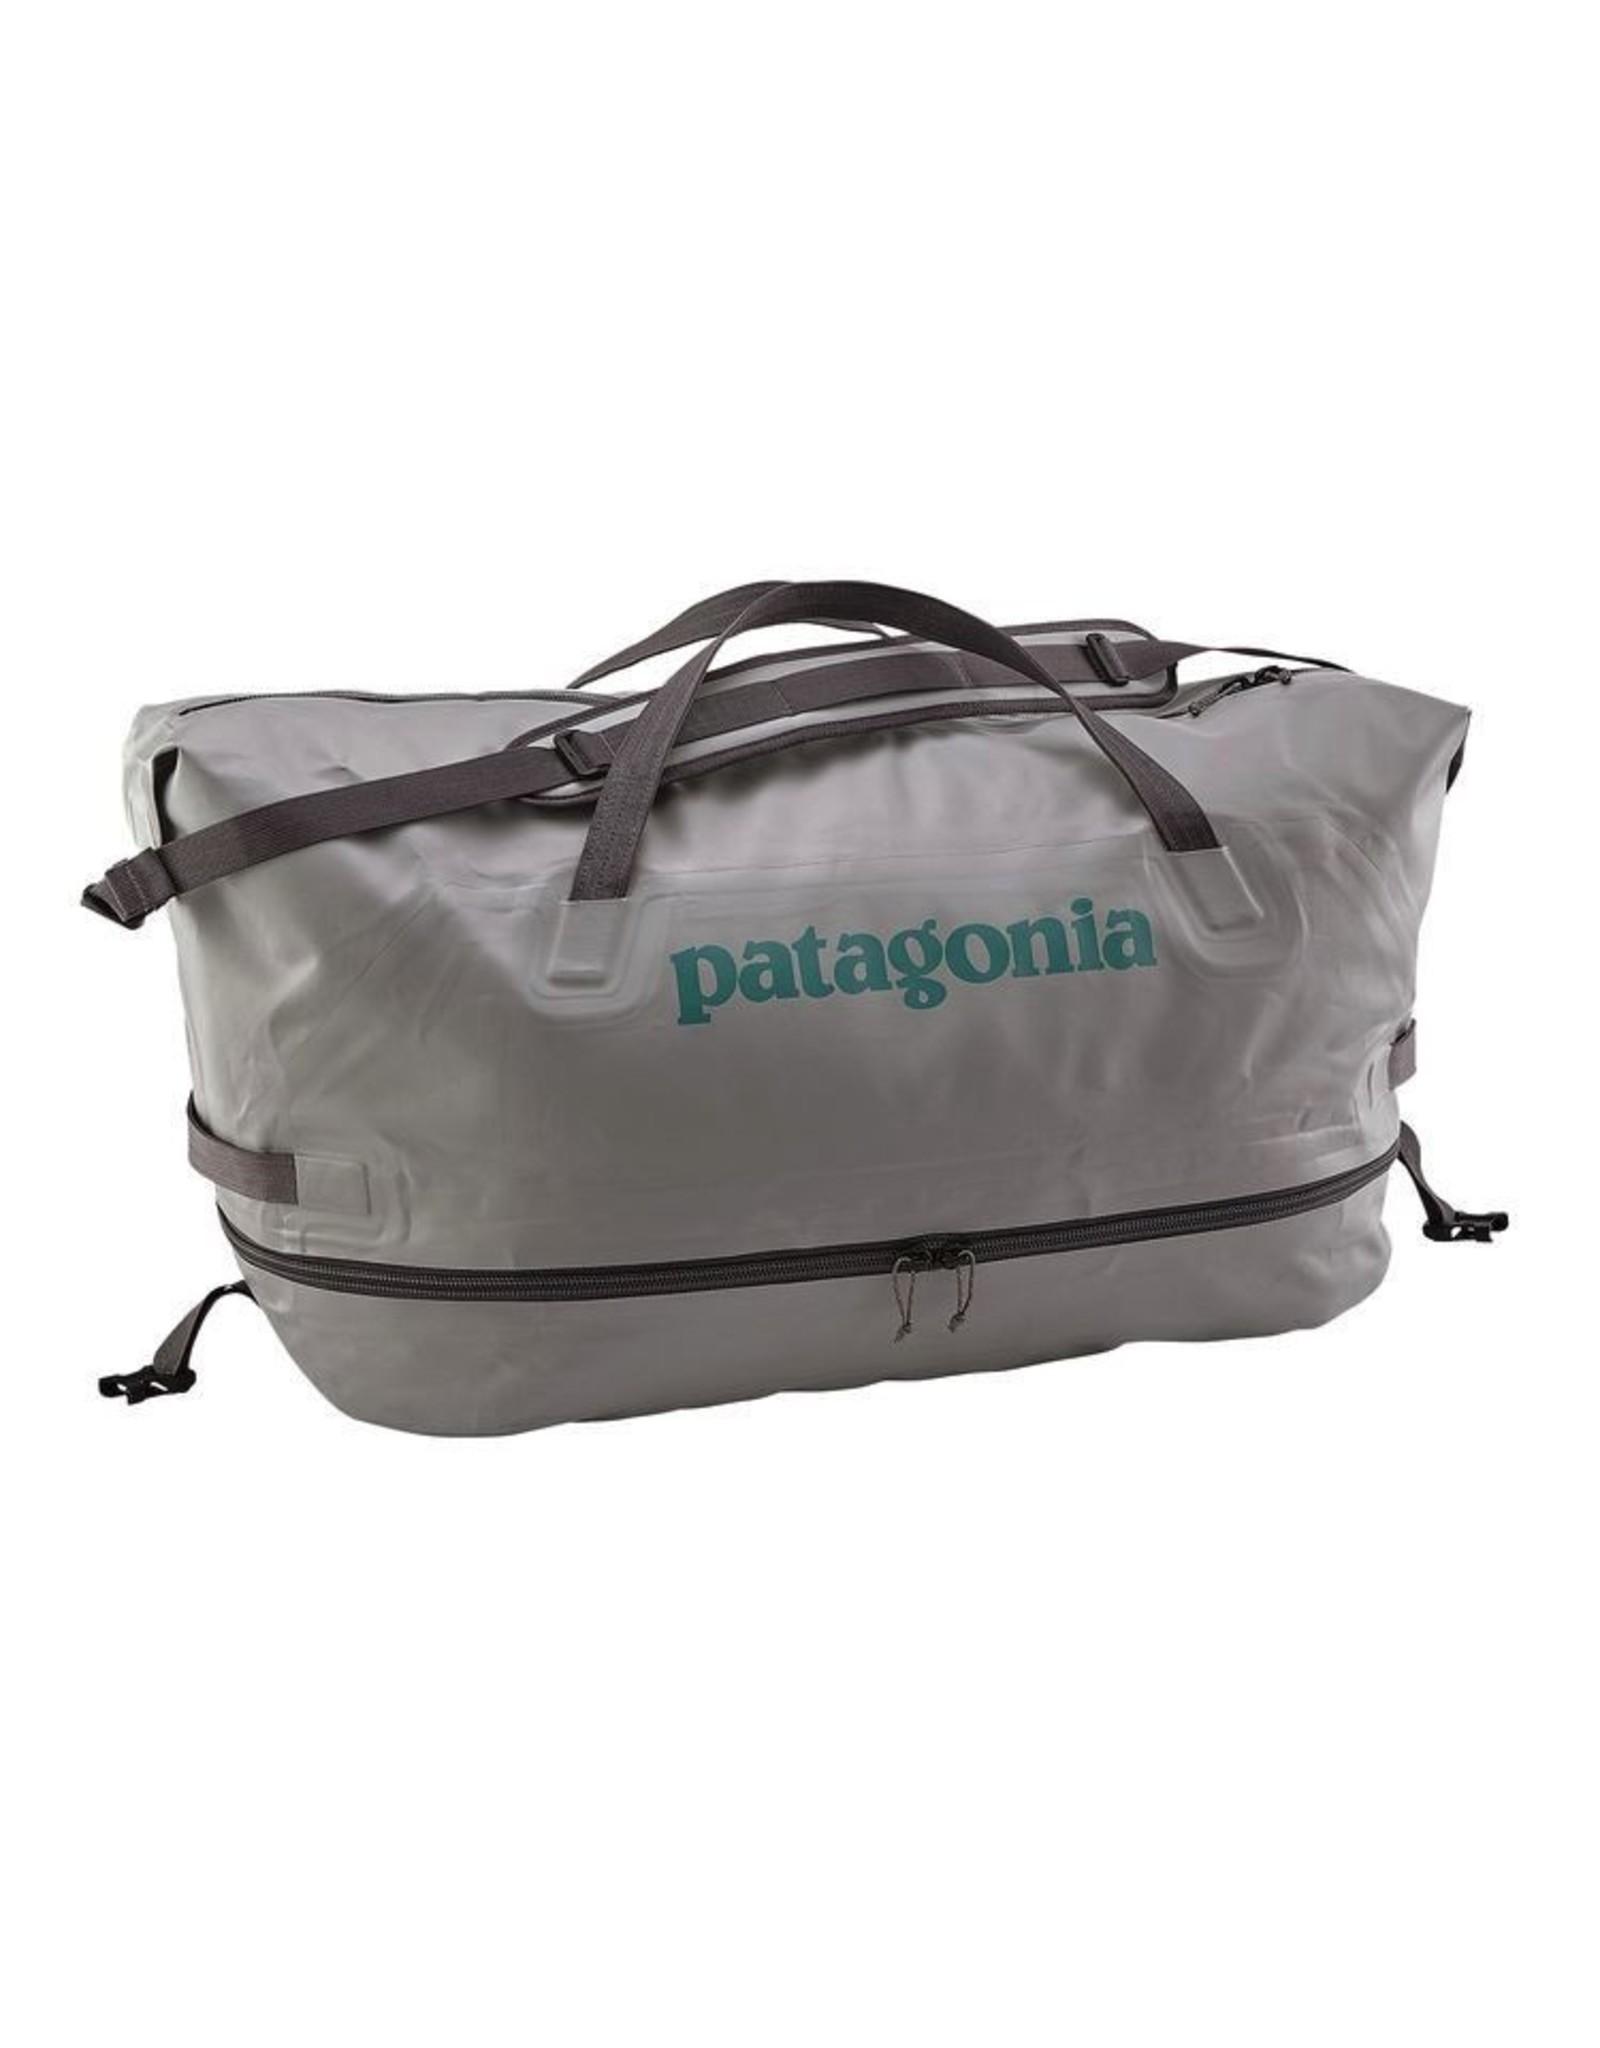 Patagonia Patagonia Stormfront Wet/Dry Duffel 65L Drifter Grey